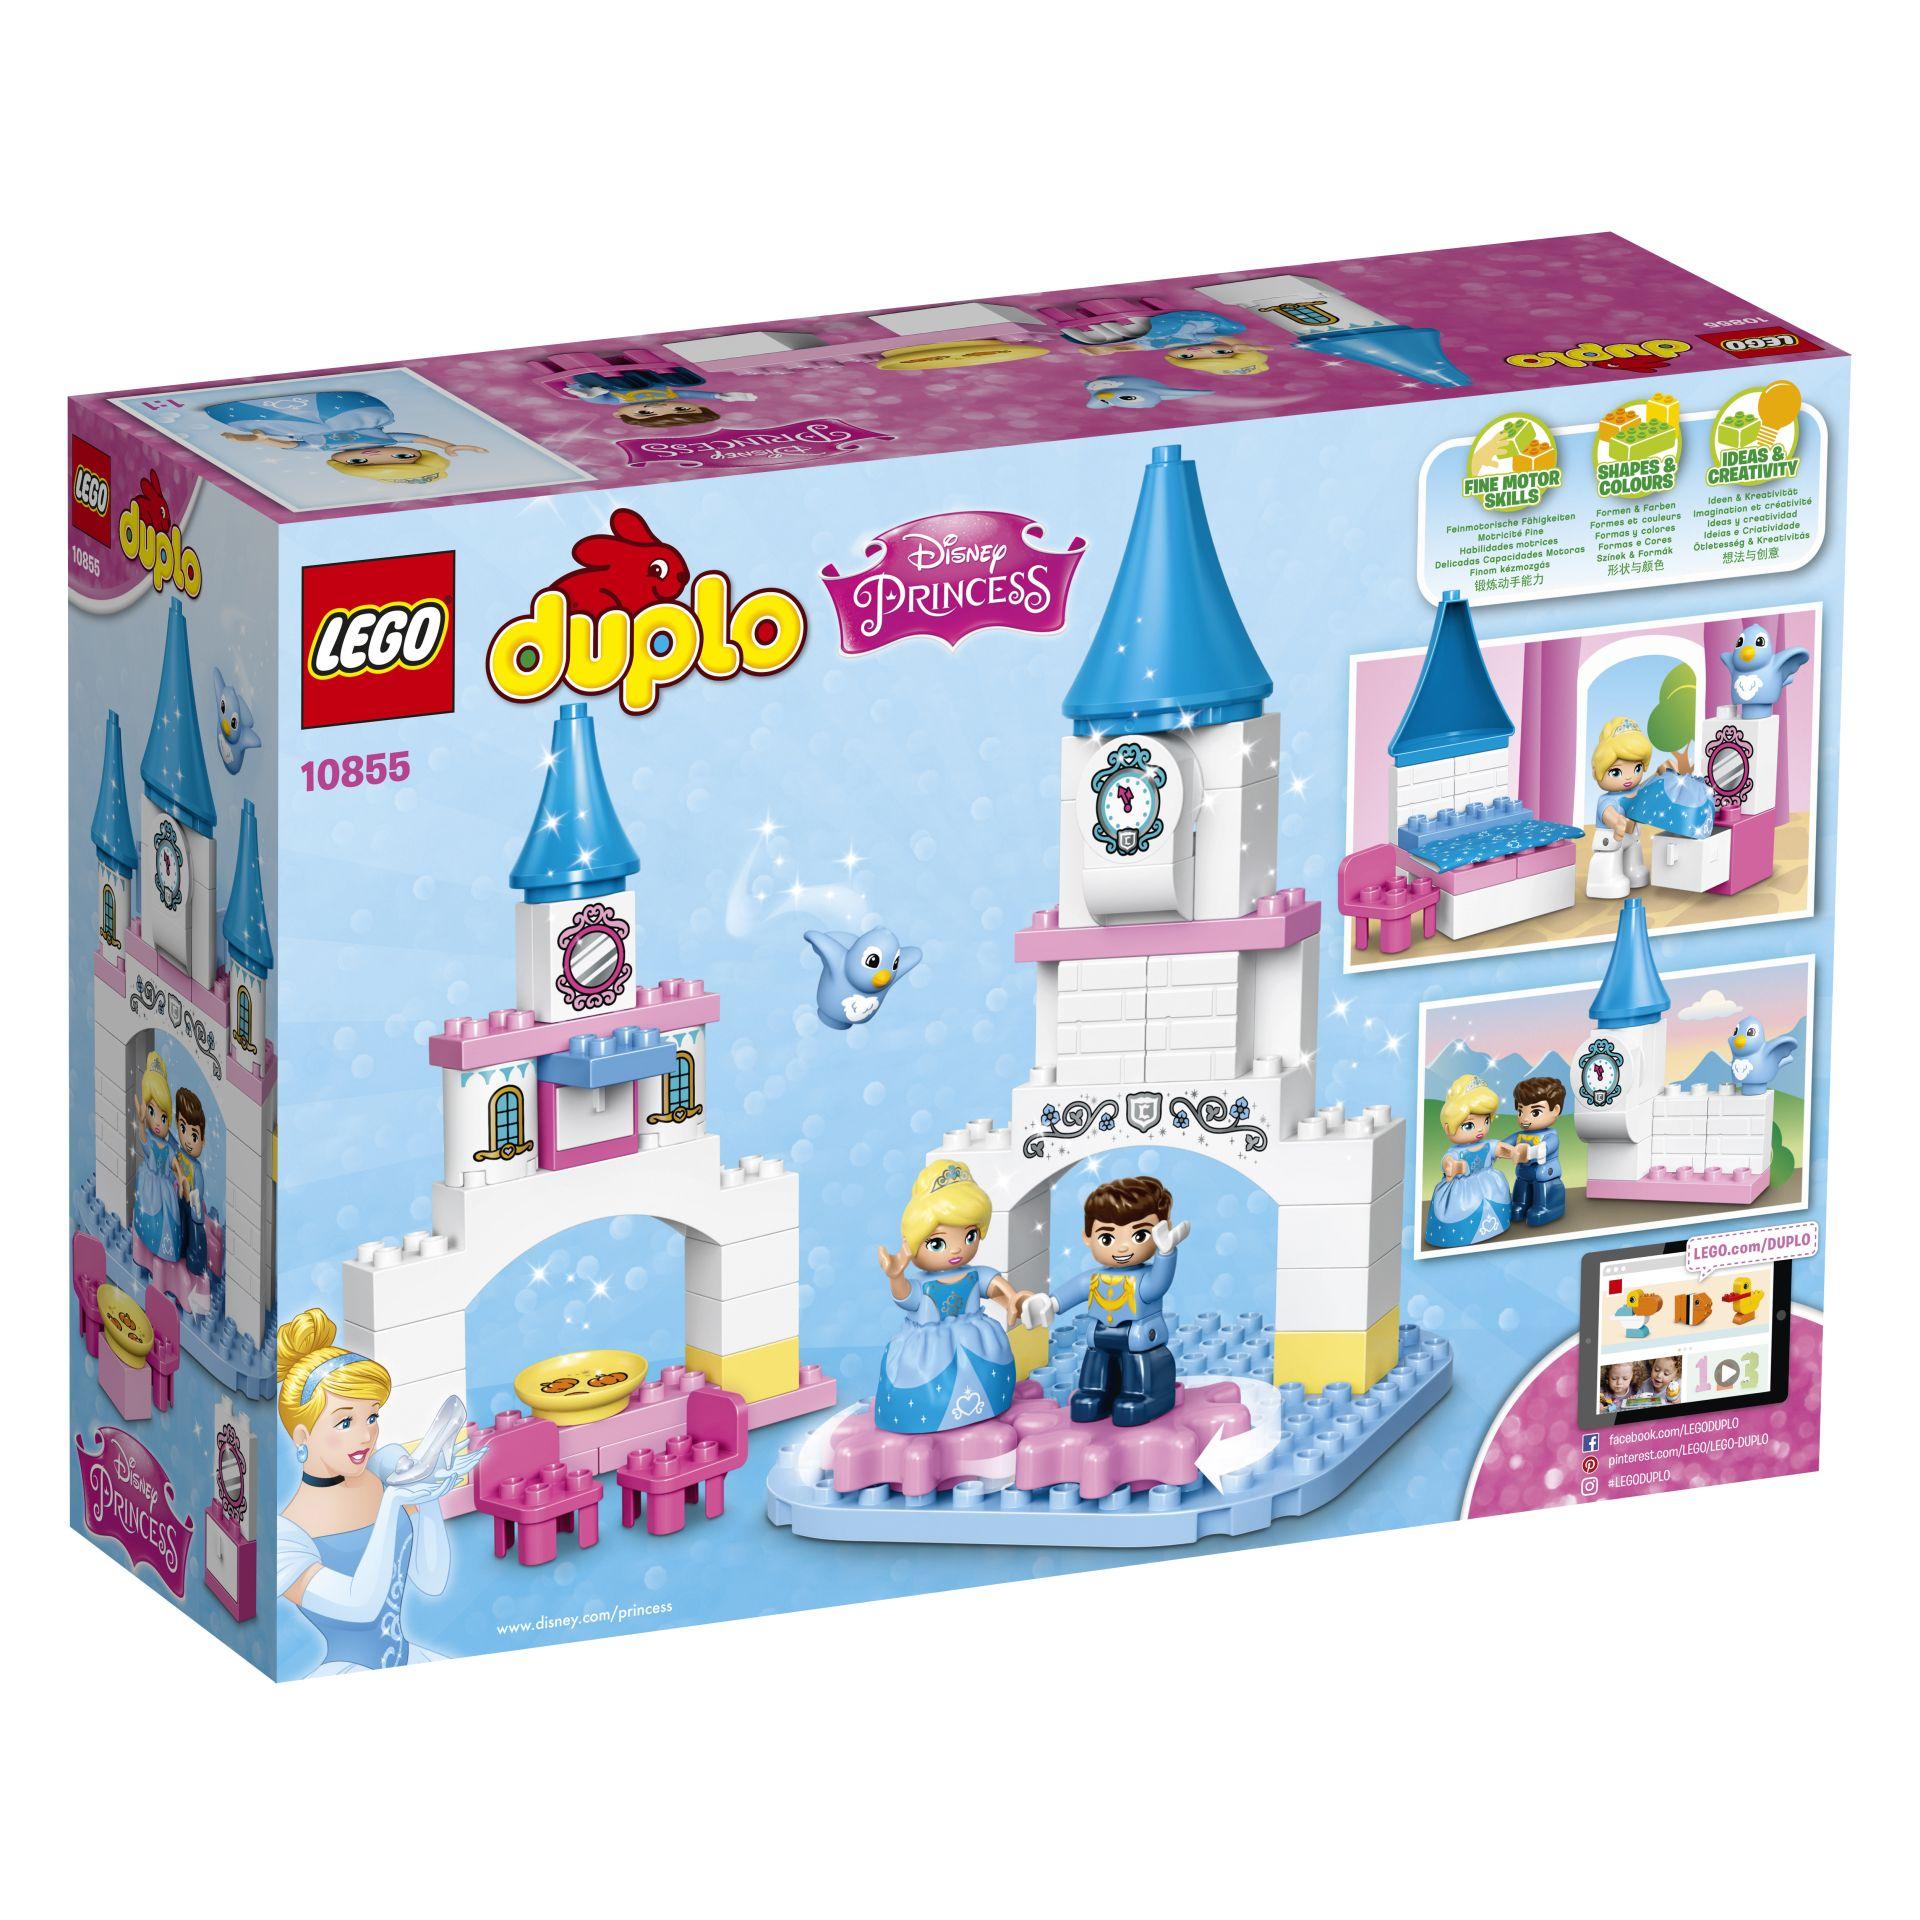 lego duplo disney princess cinderella's fairy-tale castle 2017